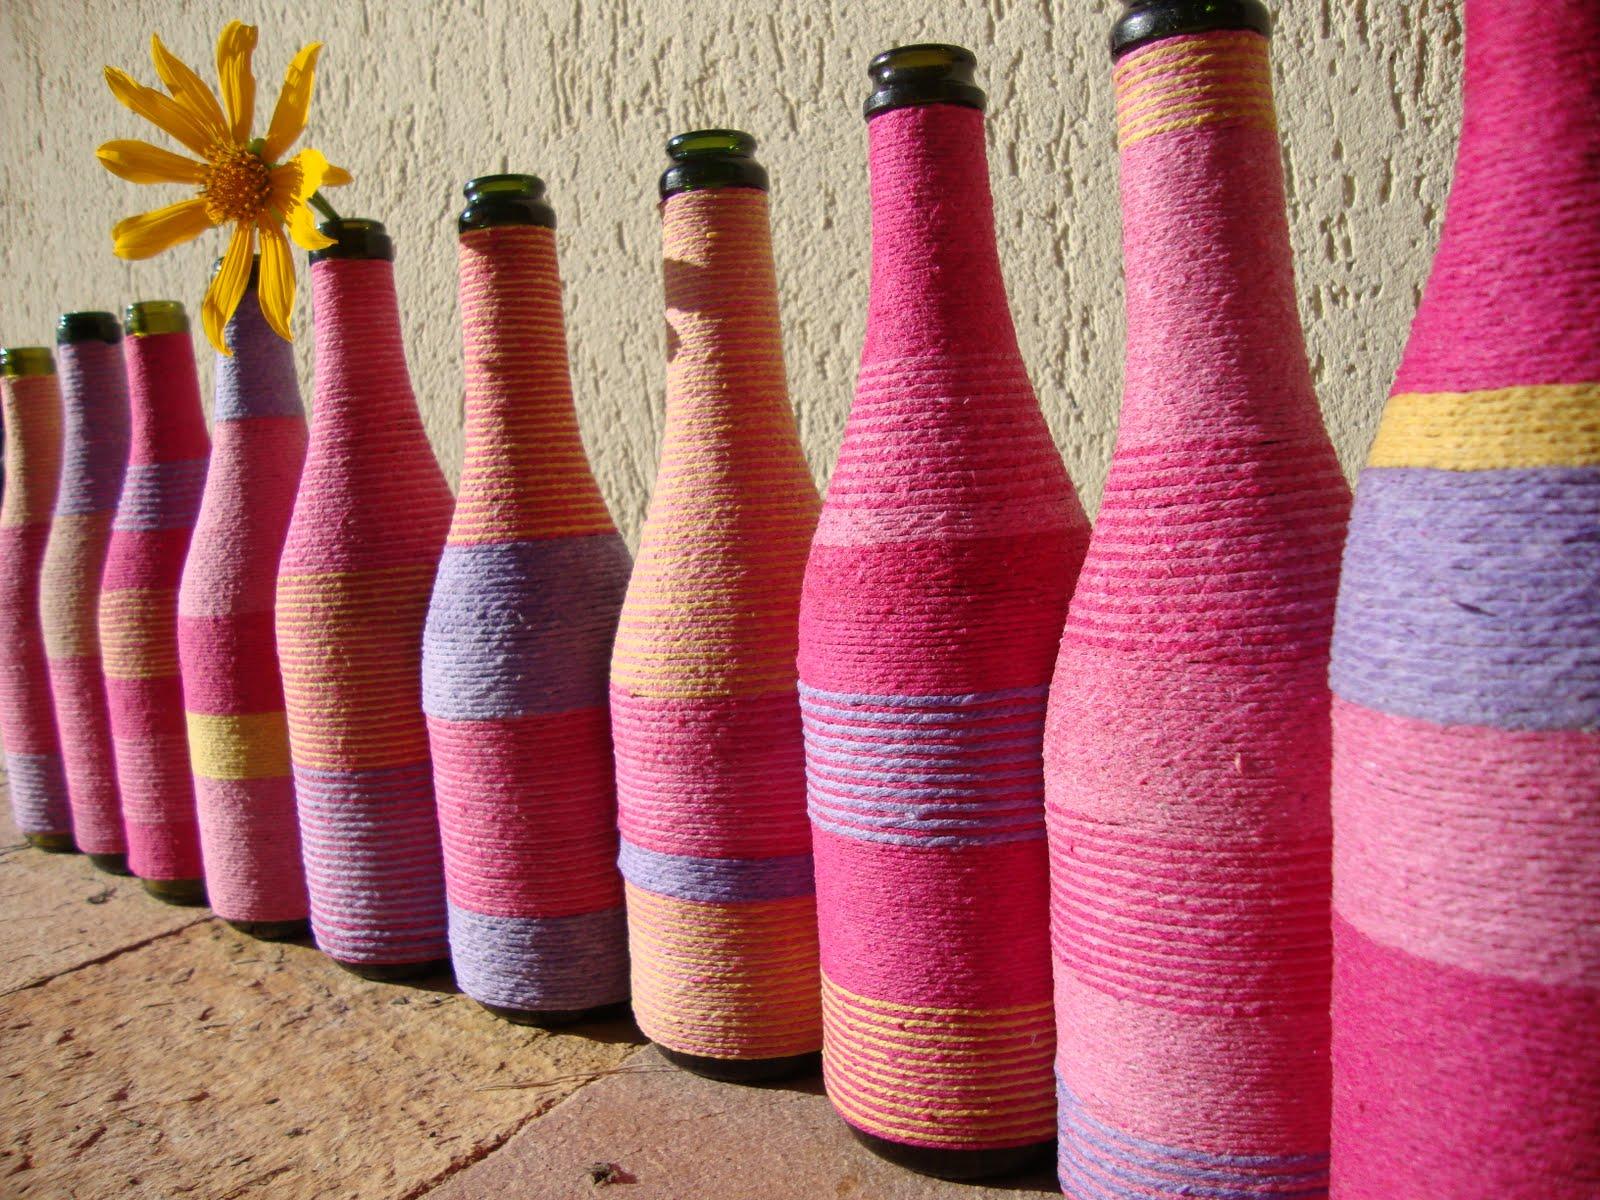 Recriando Artes Manuais : reutilizando garrafas de vidro! #7E1C27 1600x1200